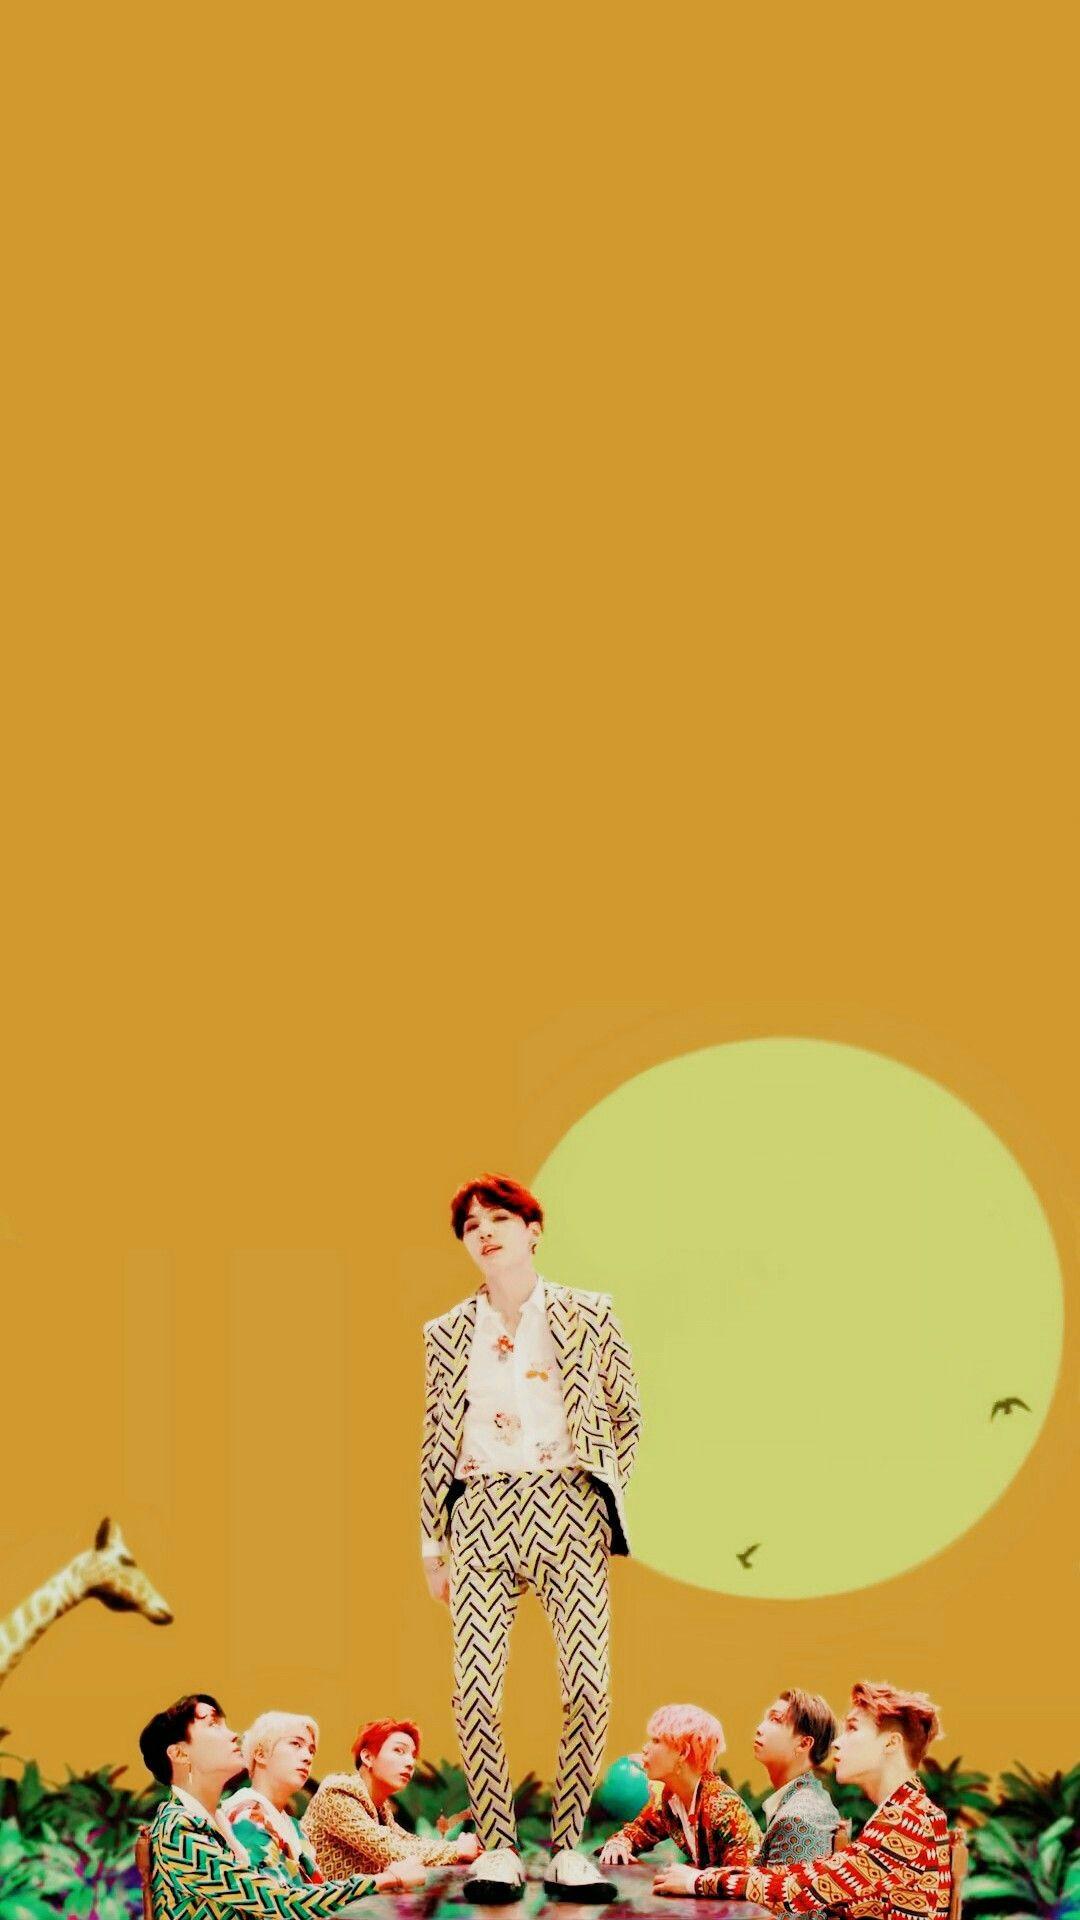 180824 #BTS 'IDOL' Official ❤ #SUGA